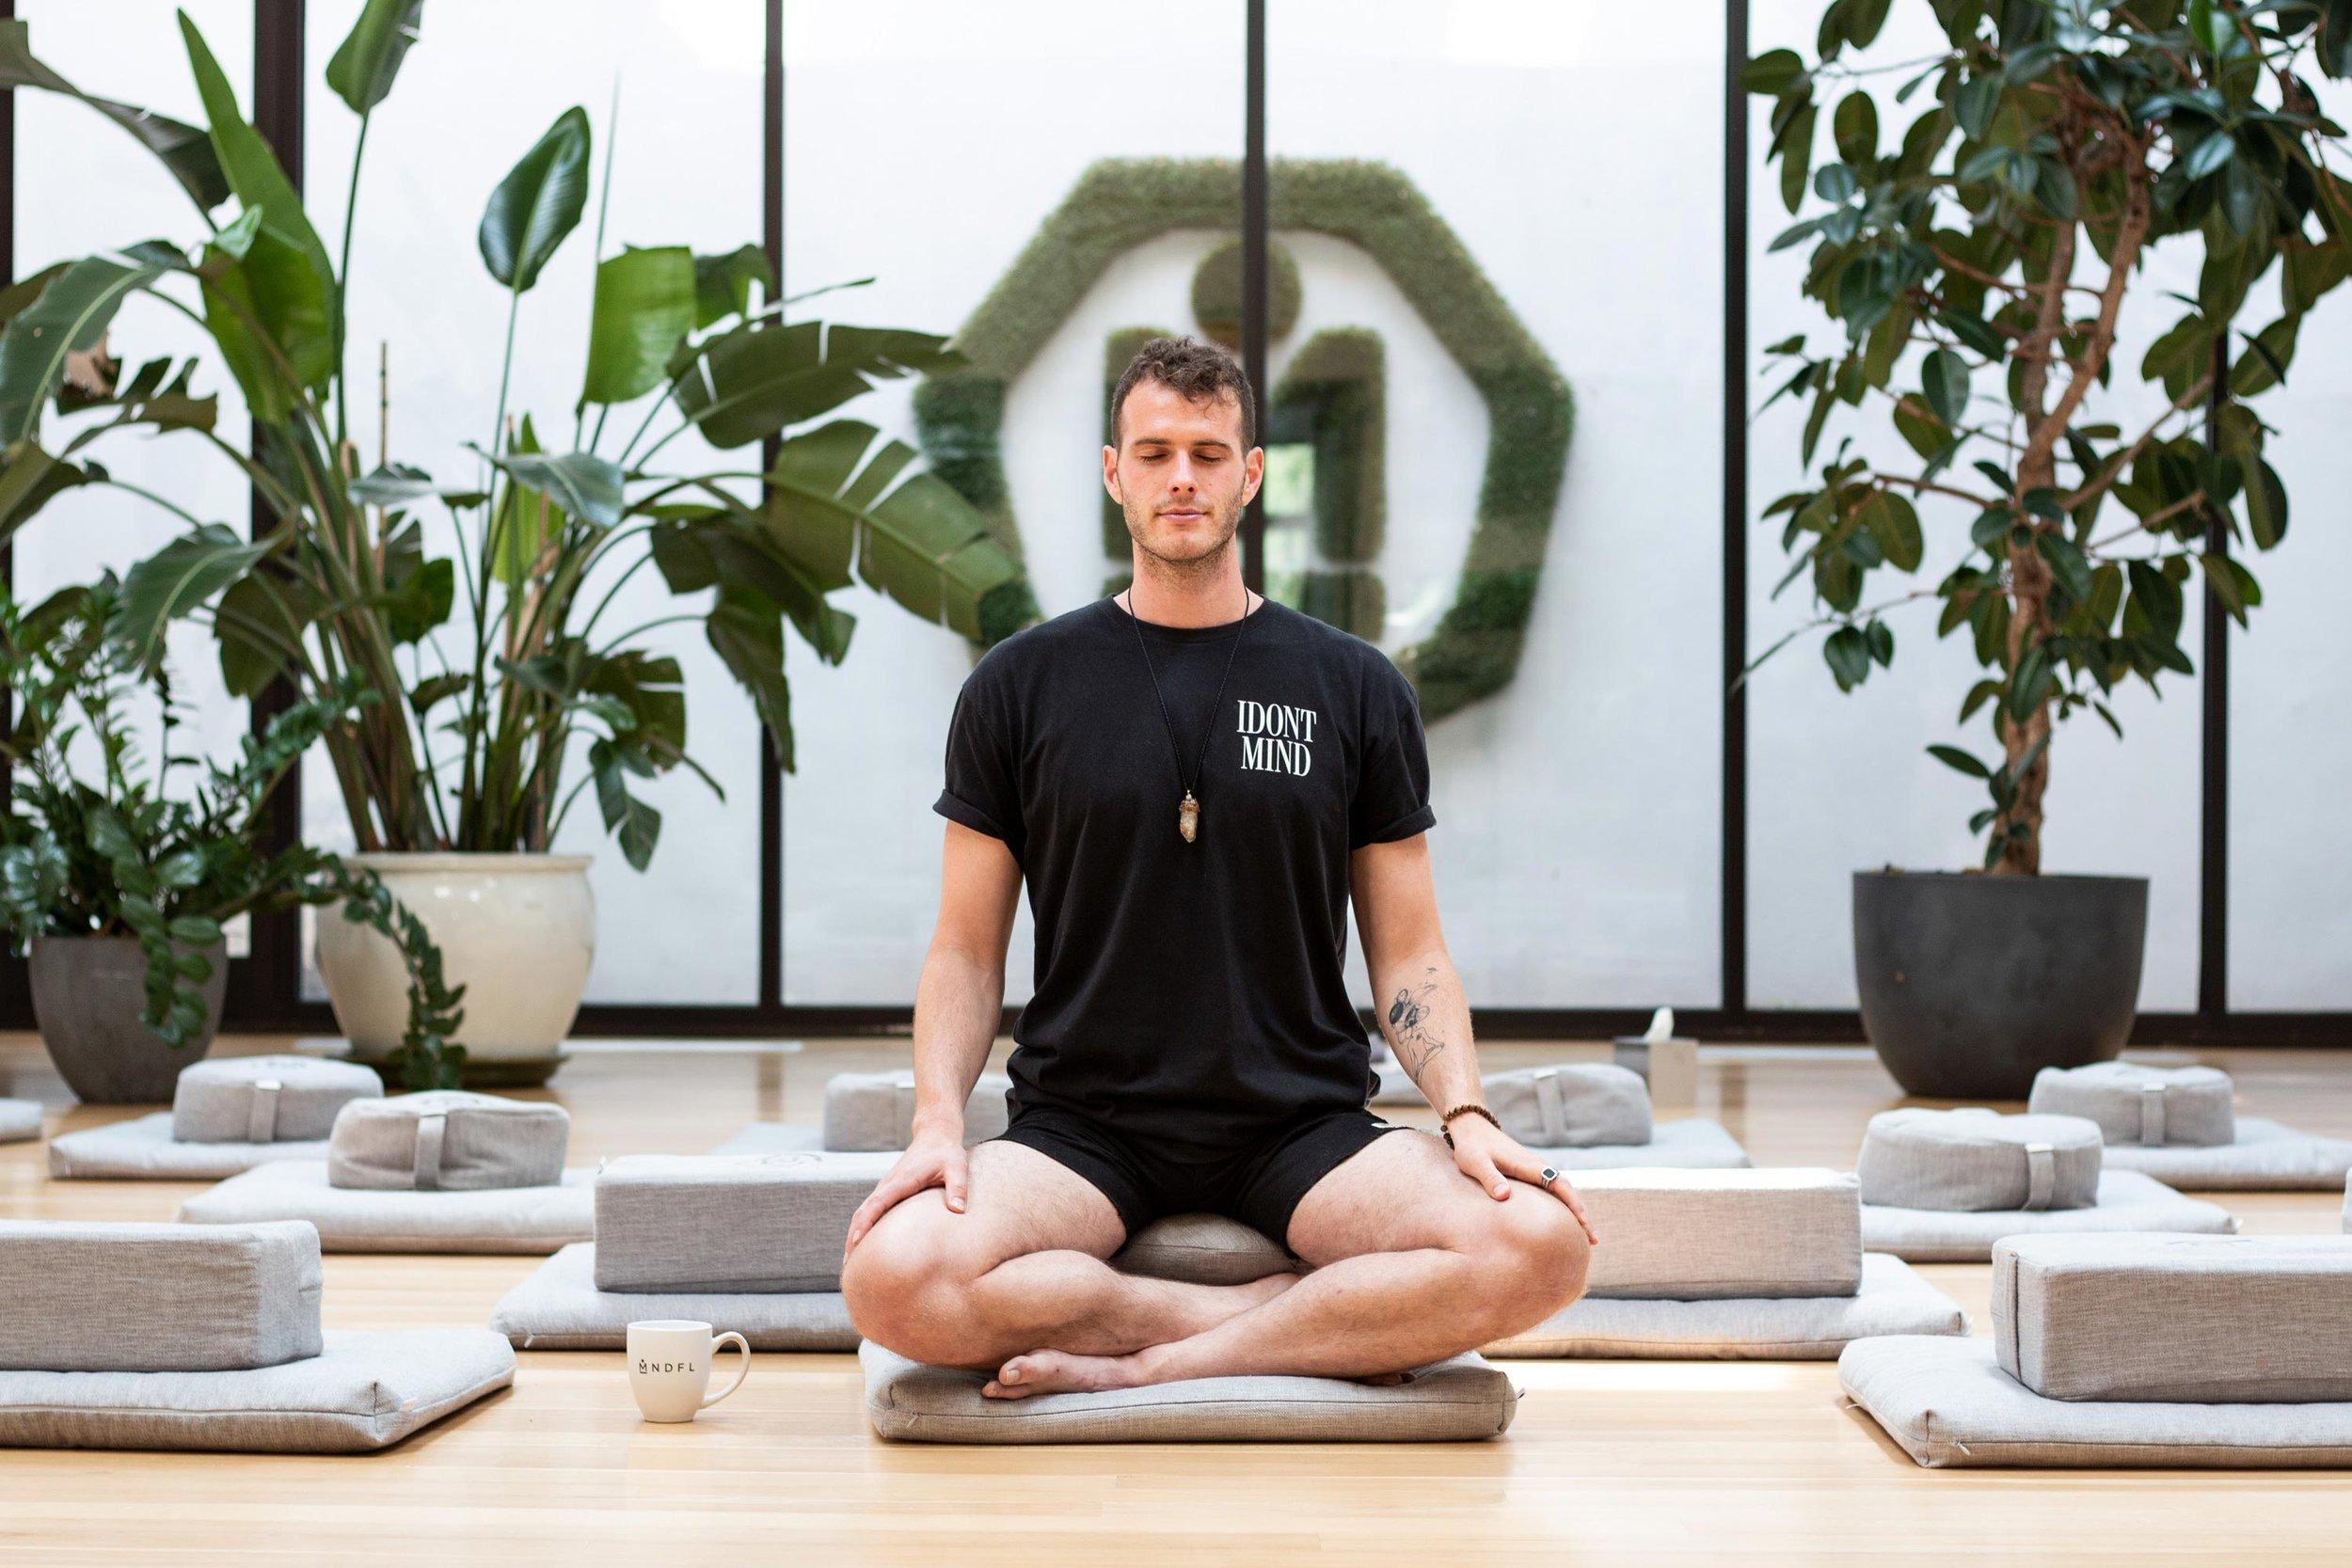 idontmind-mndfl-meditation-questions.jpg